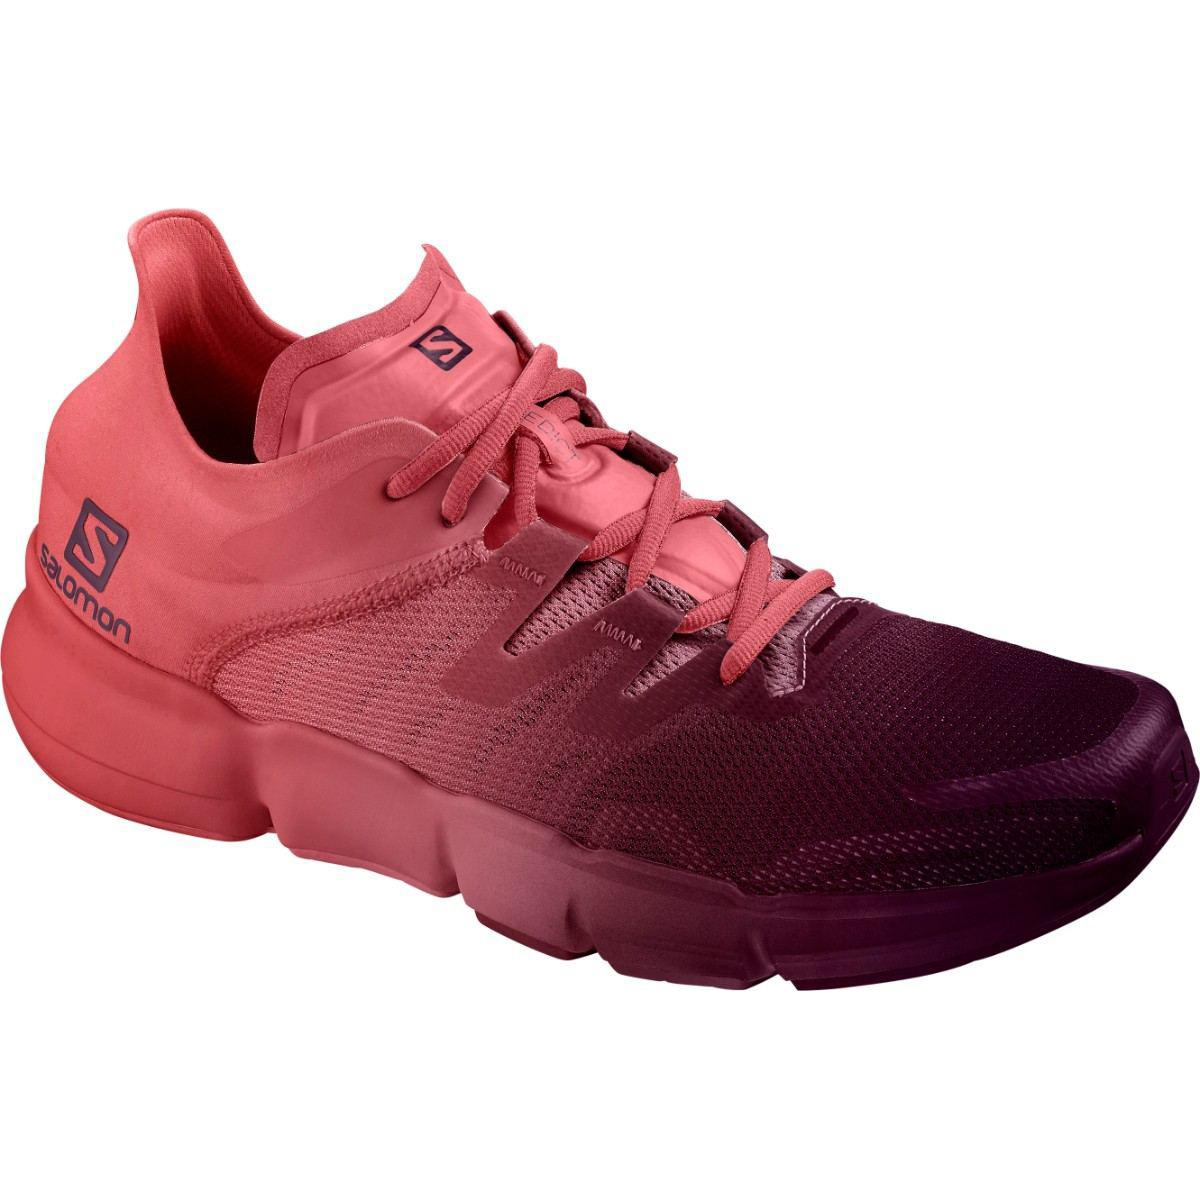 Pantofi alergare Salomon PREDICT RA W - Rosu